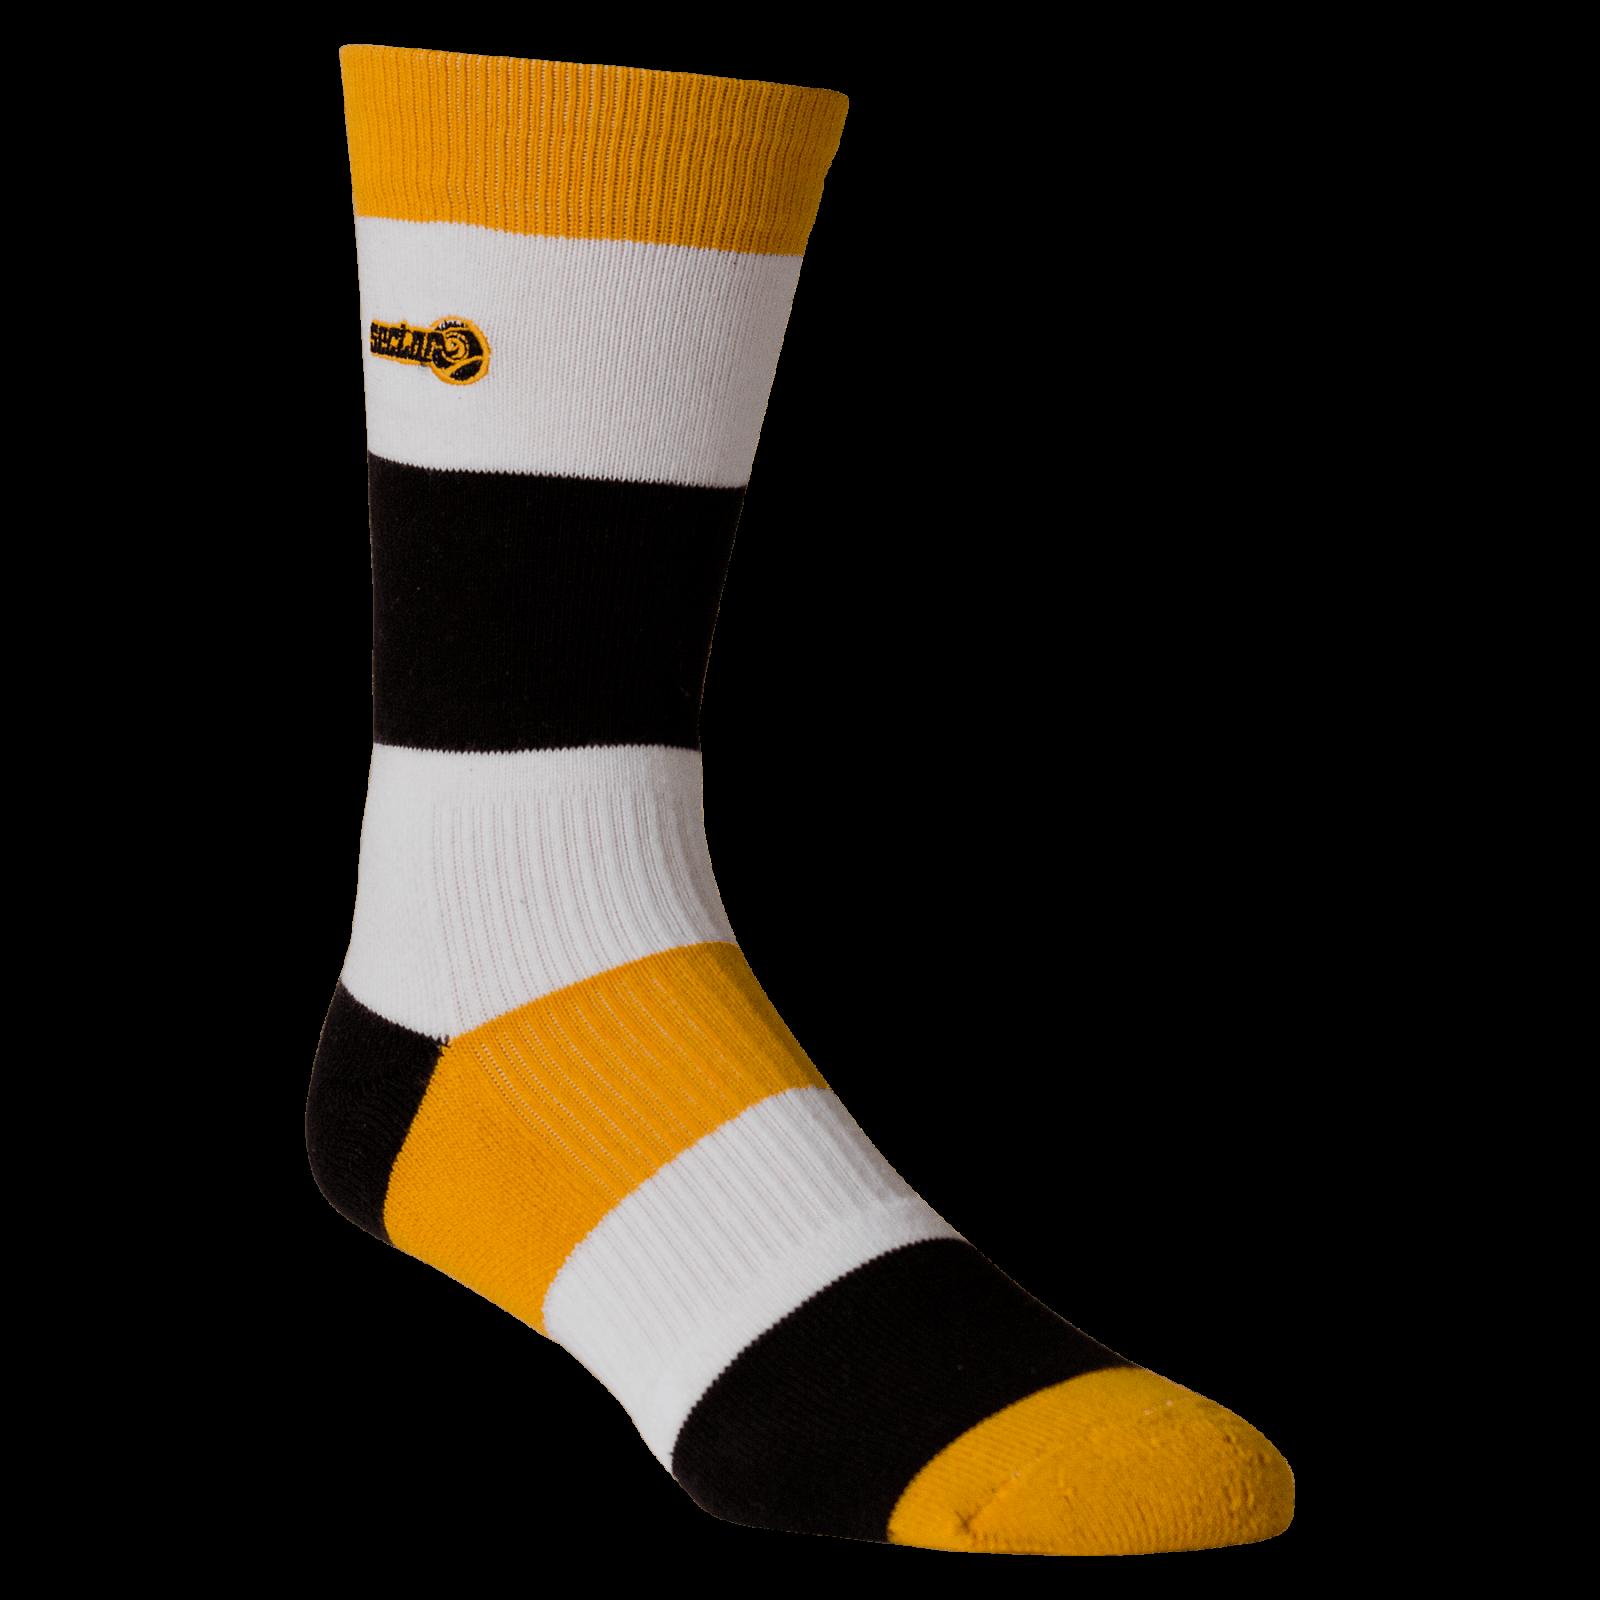 Sector 9 Bandito Sock